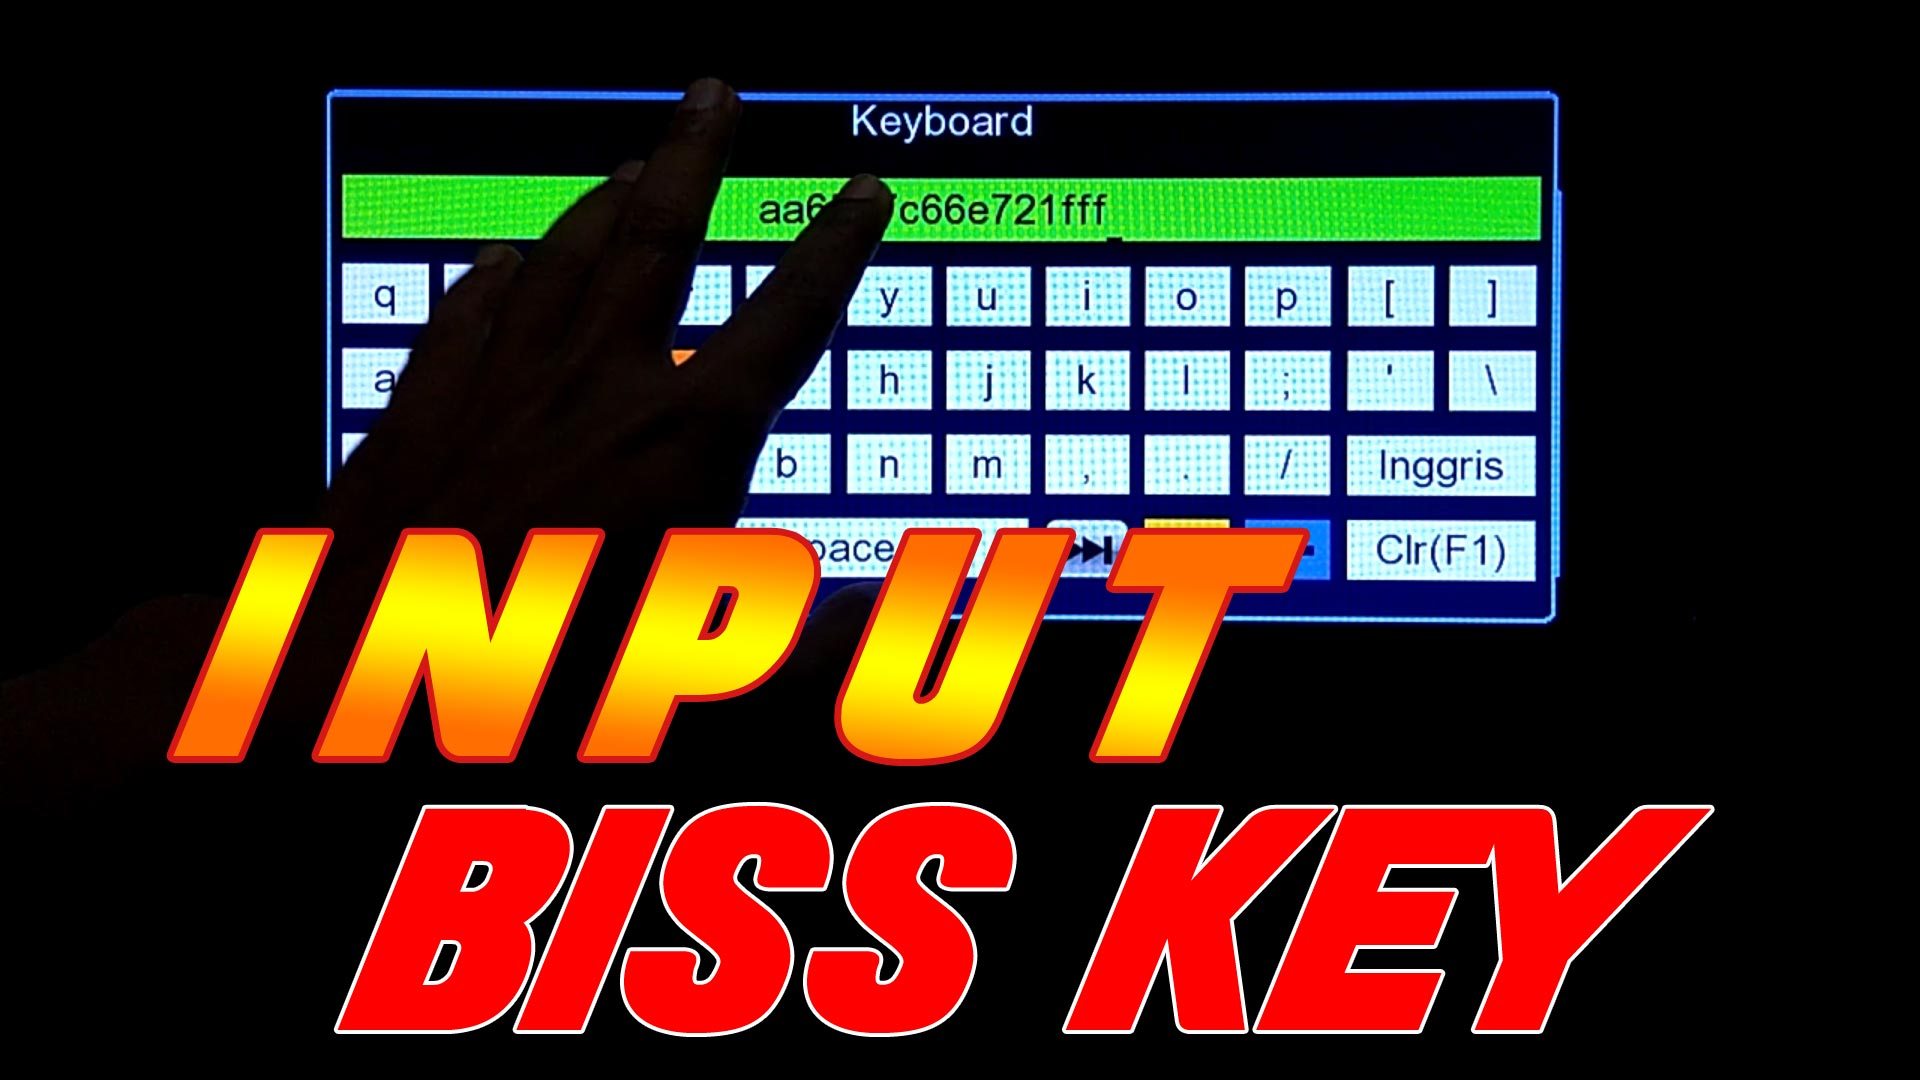 Cara Memasukkan Bisskey di Lgsat Bigbang Guoxin GX6605S